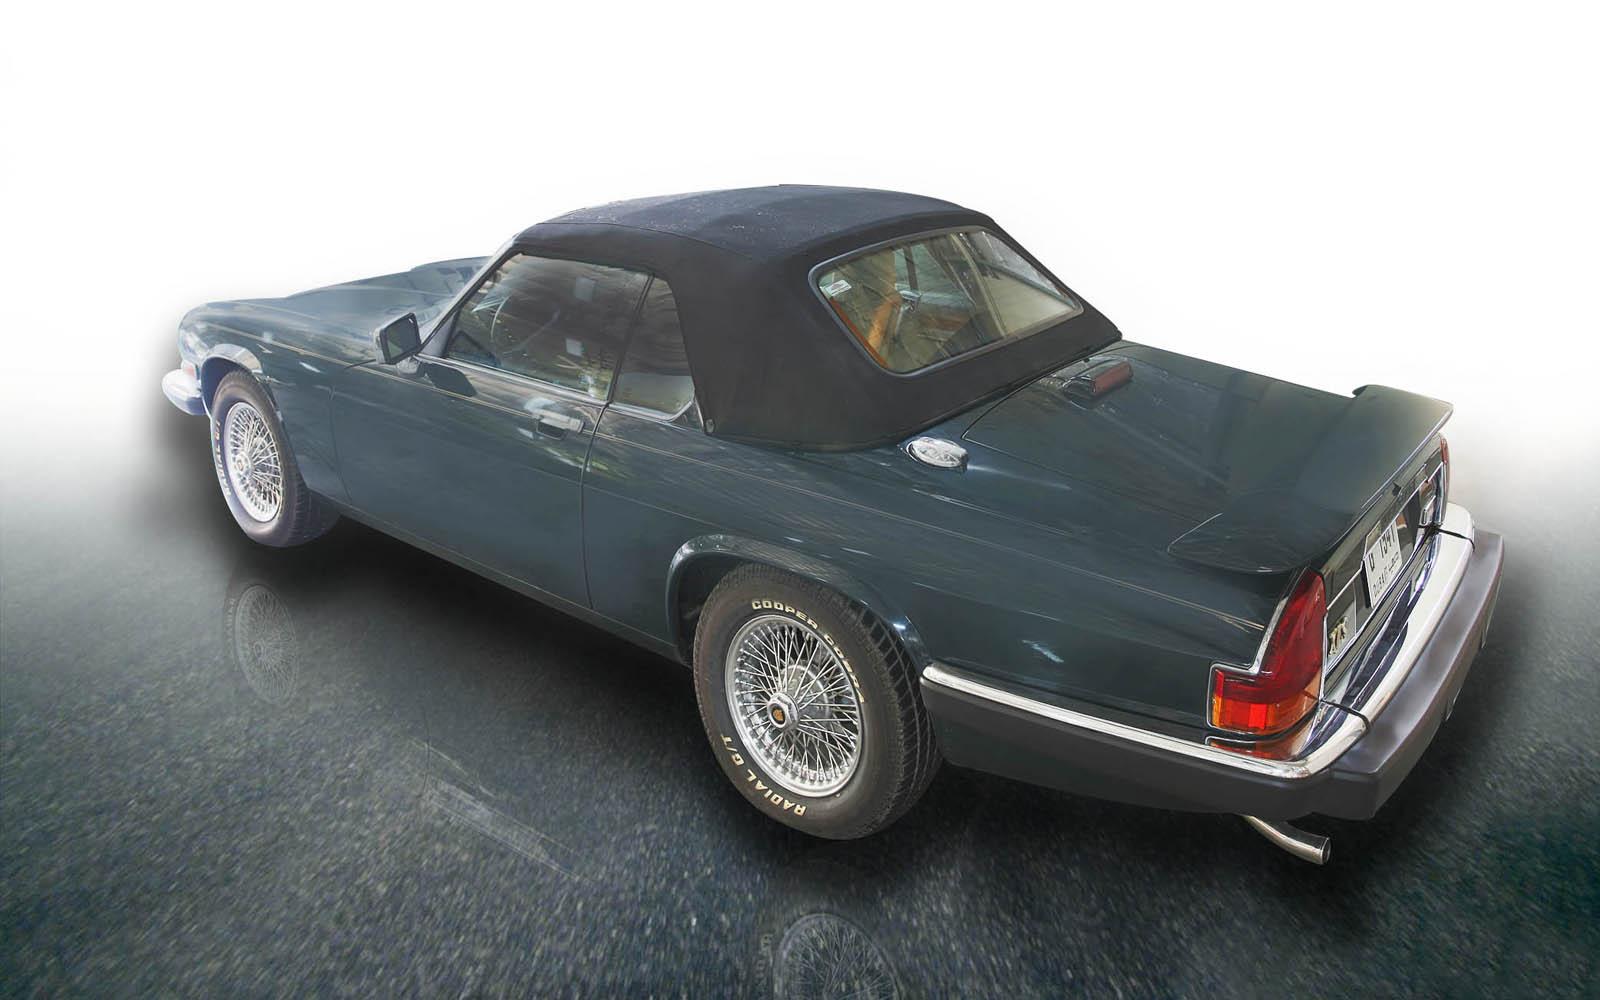 1991 Jaguar XJShttps://www.firstcarclassic.com/wp-content/uploads/2015/01/green-jaguar-firstcarclassic-1.jpghttps://www.firstcarclassic.com/wp-content/uploads/2015/01/green-jaguar-firstcarclassic-1-300x300.jpg